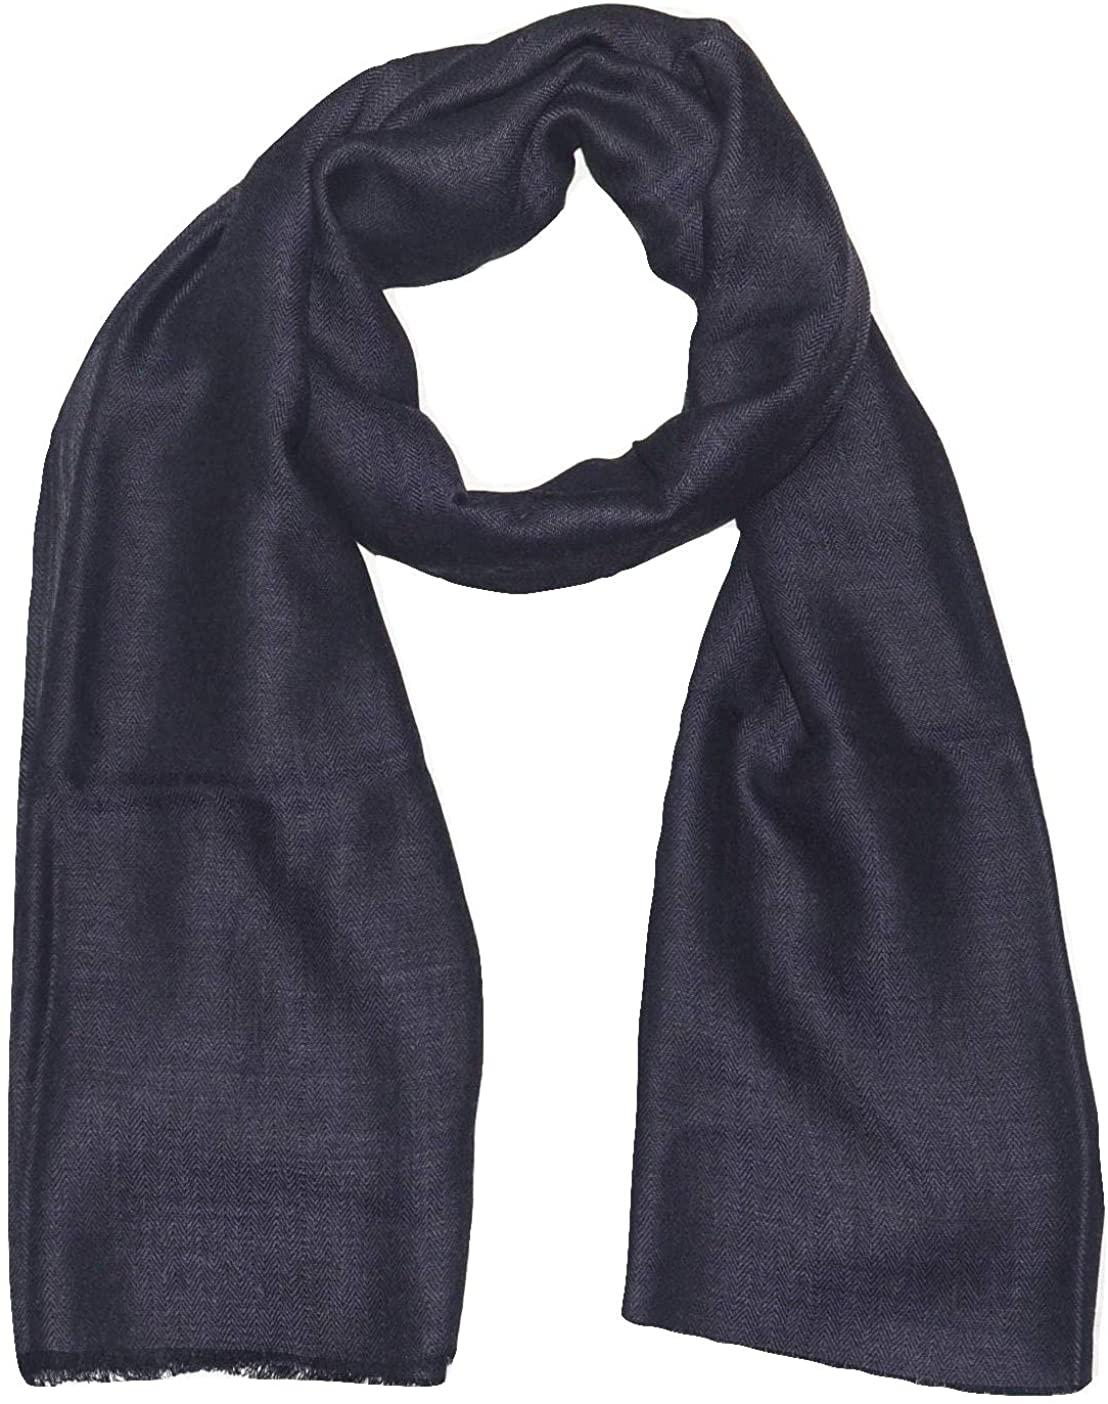 Pashmina Scarf, Fine Wool & Silk, Two Tone Herringbone Jacquard, Soft, Light, Warm Autumn Winter Scarf.